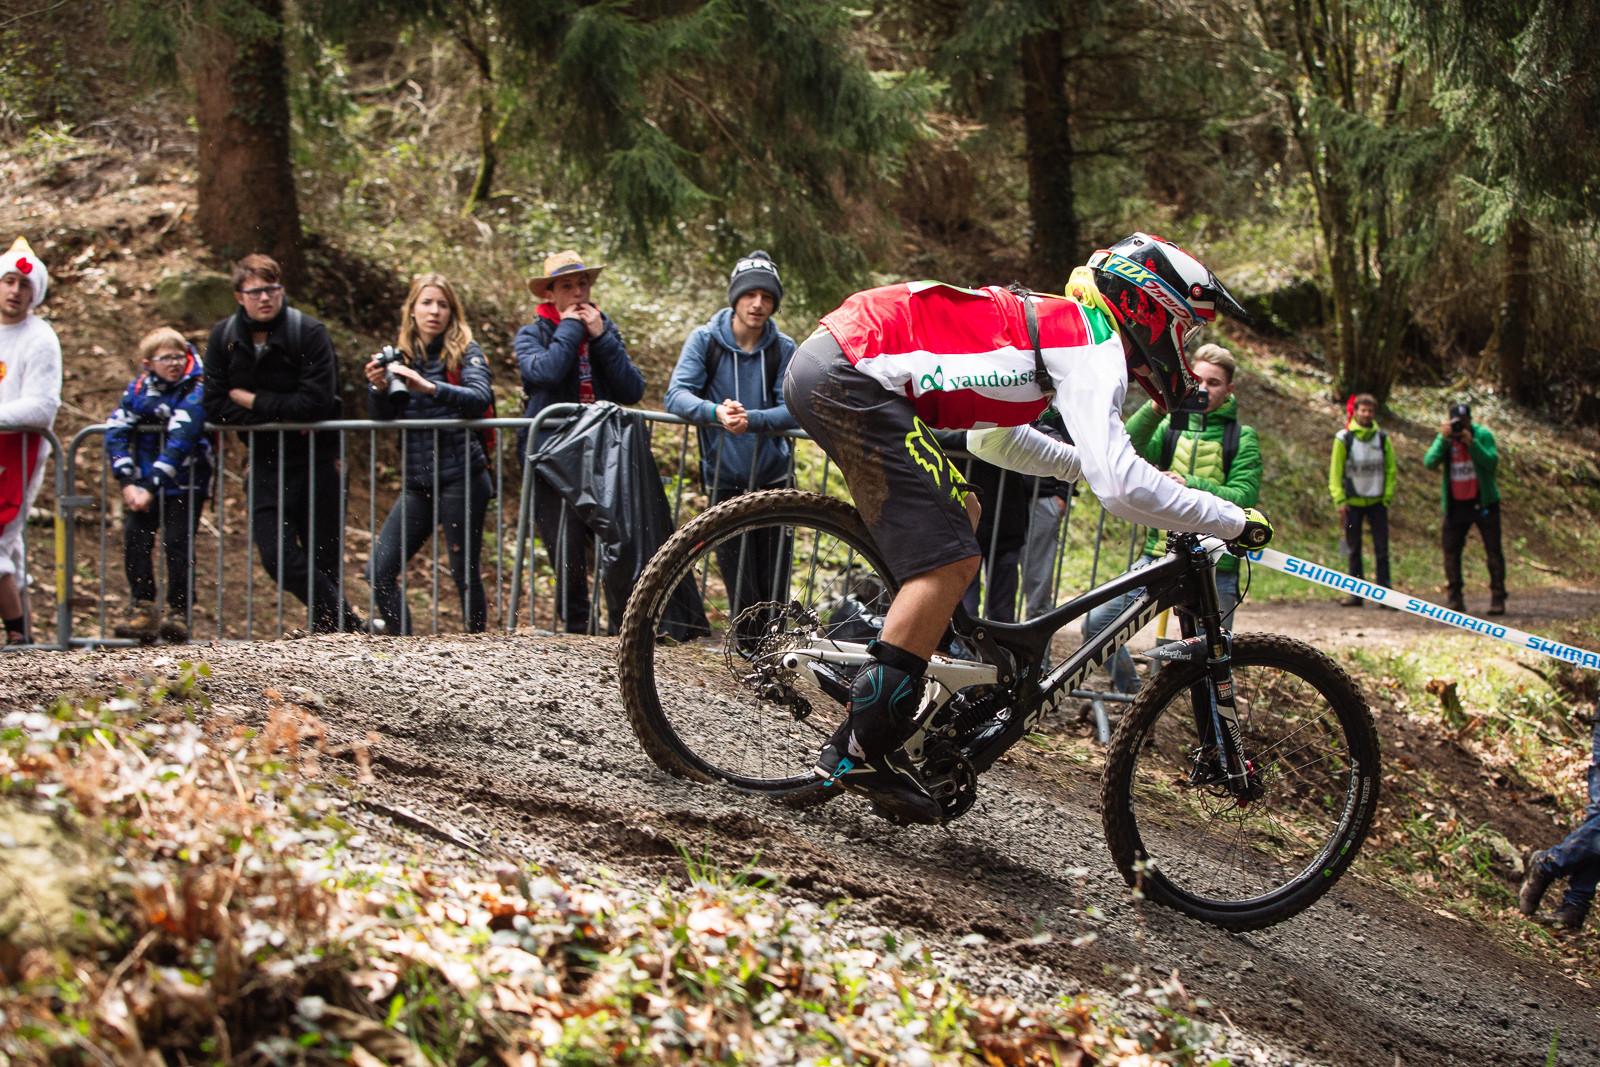 Santa Cruz V10 Bottom Out at Lourdes World Cup - G-Out Project - Lourdes World Cup DH - Mountain Biking Pictures - Vital MTB